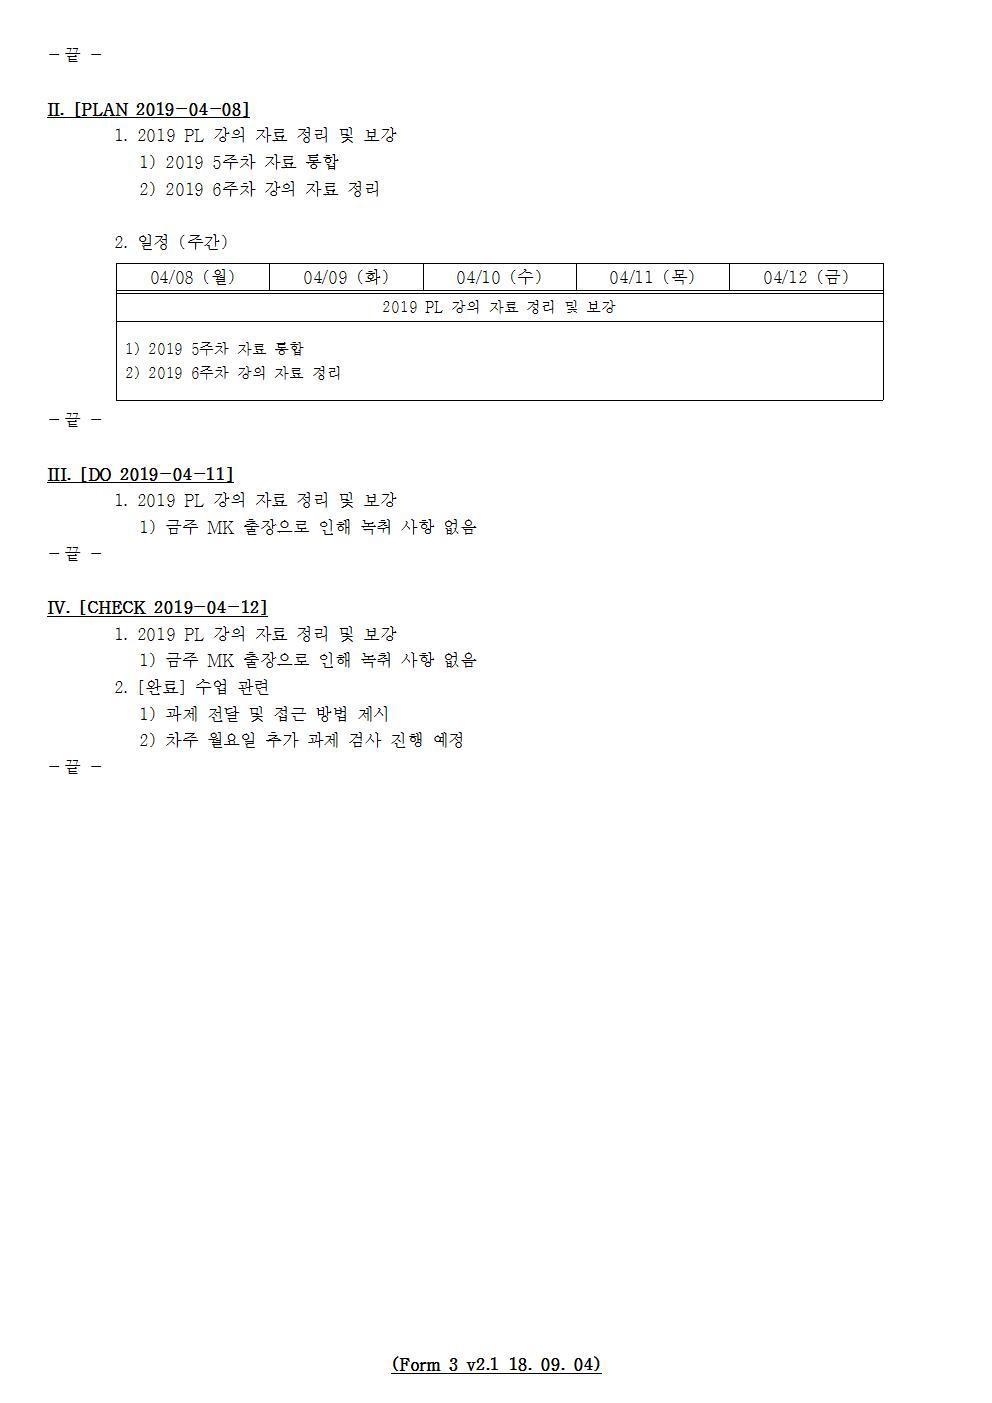 D-[19-014-PP-06]-[Book-PL]-[2019-04-12][JS]002.jpg